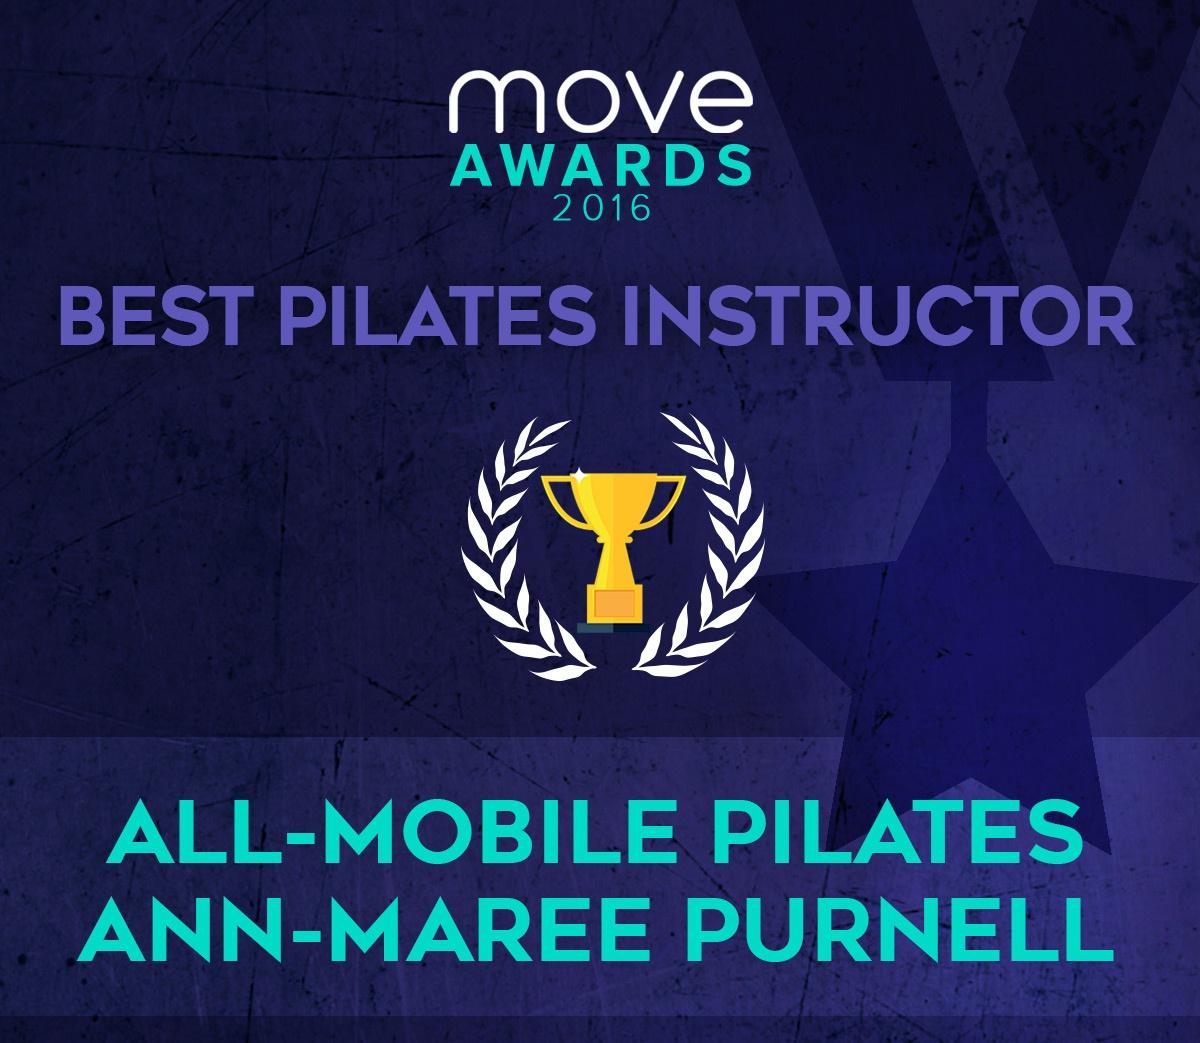 All-Mobile-Pilates-Ann-Maree-Purnell.jpg